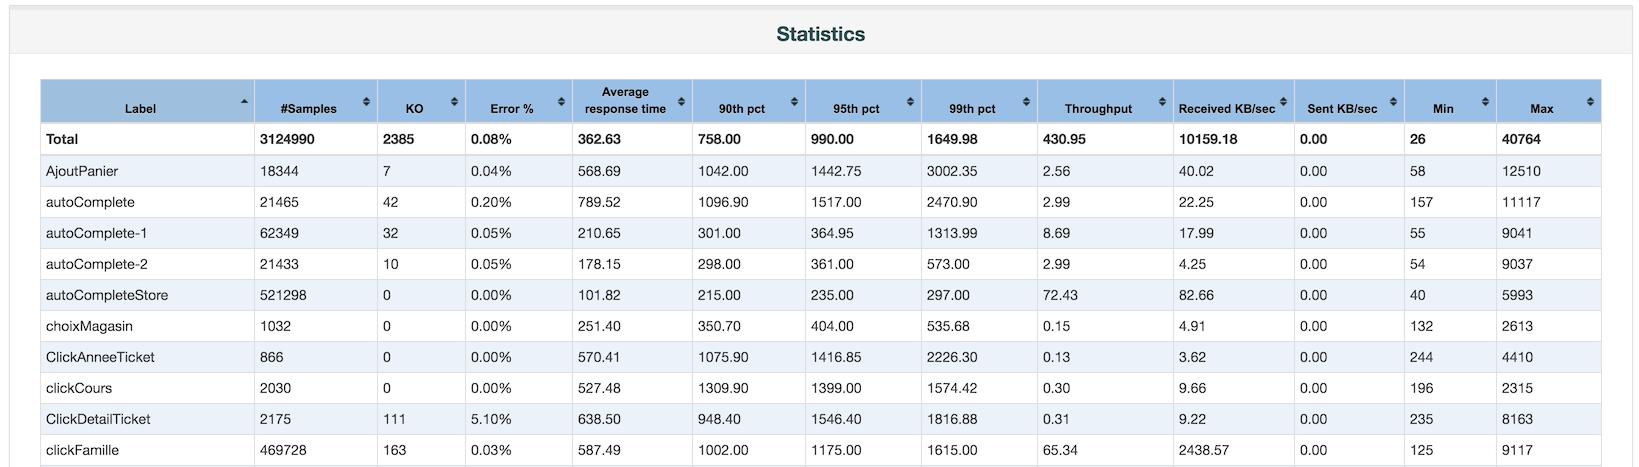 report_statistics